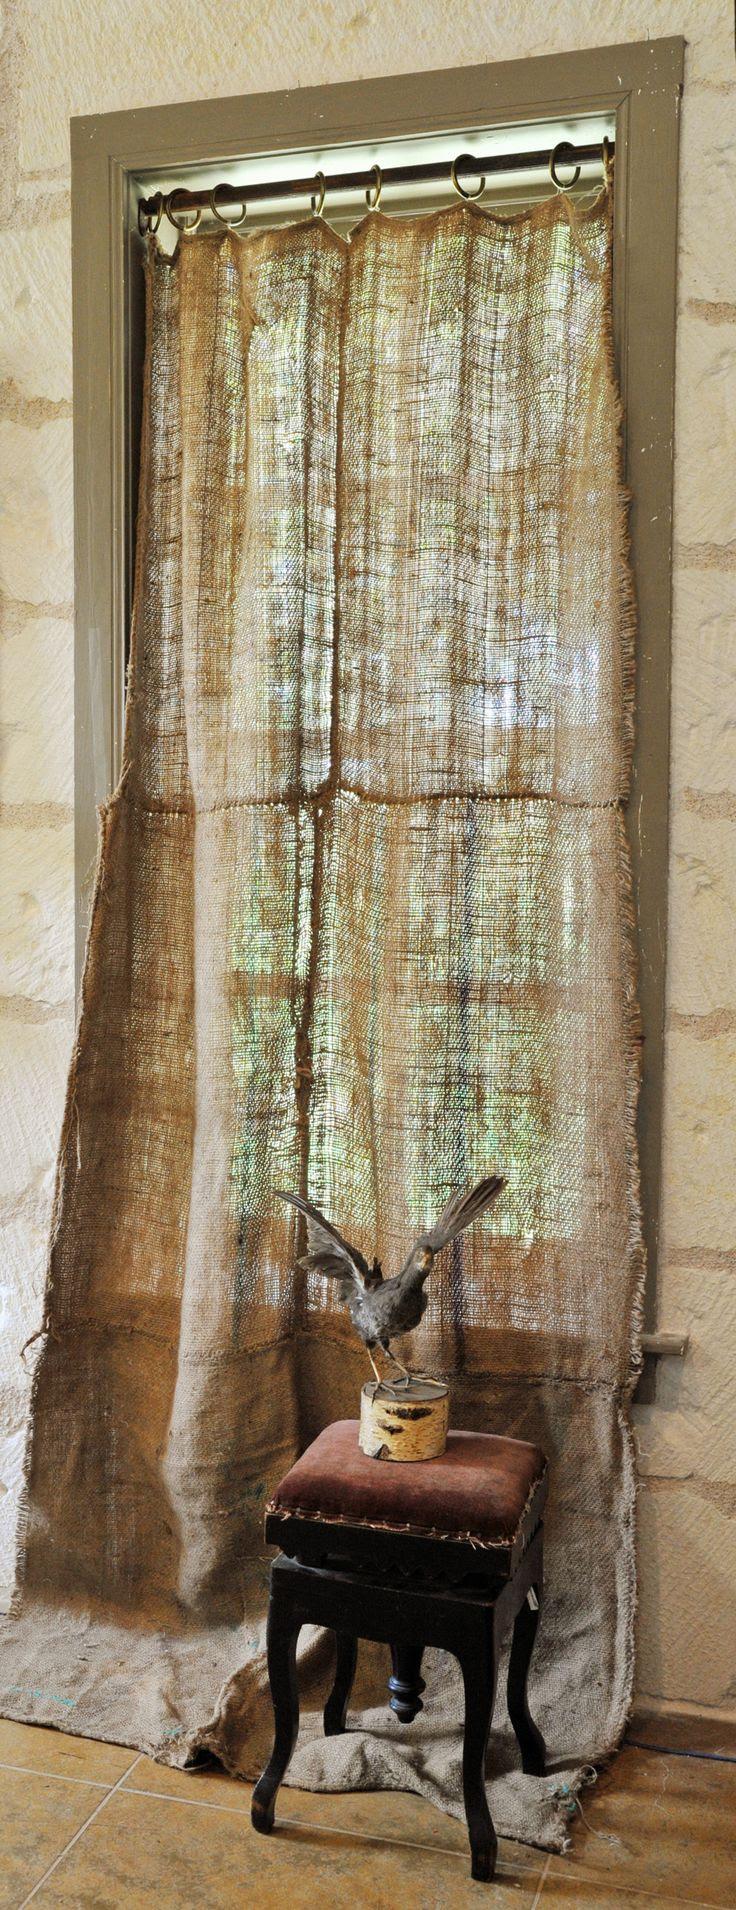 Delicious Burlap Curtains at Carol Hicks Bolton